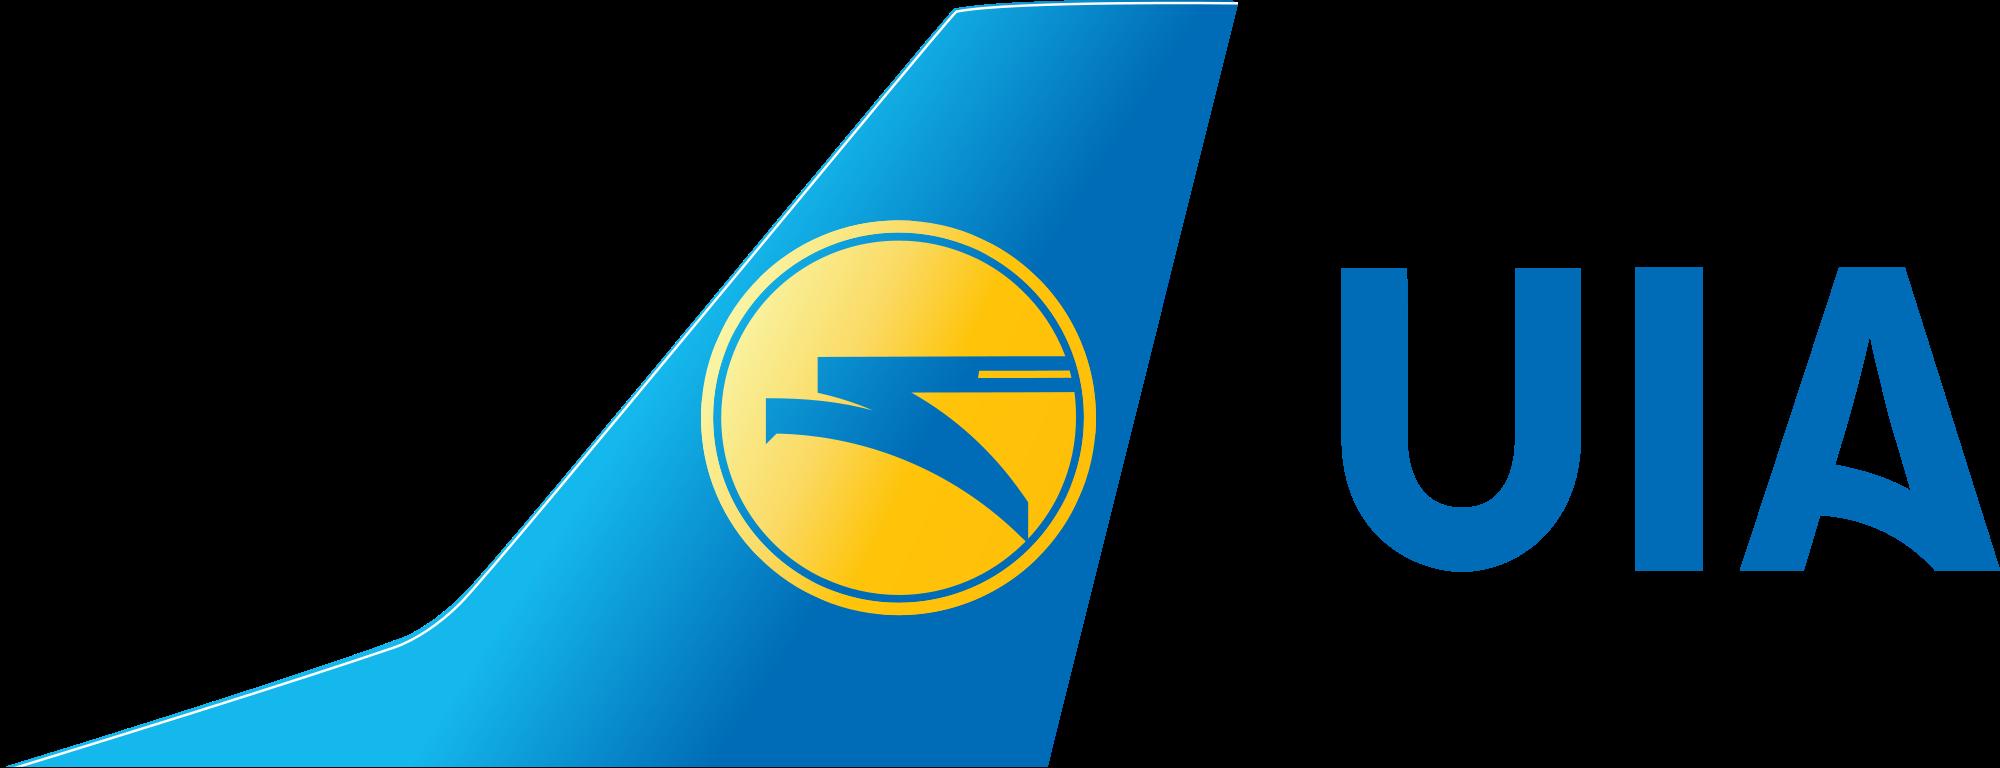 UIA Logo Wallpaper